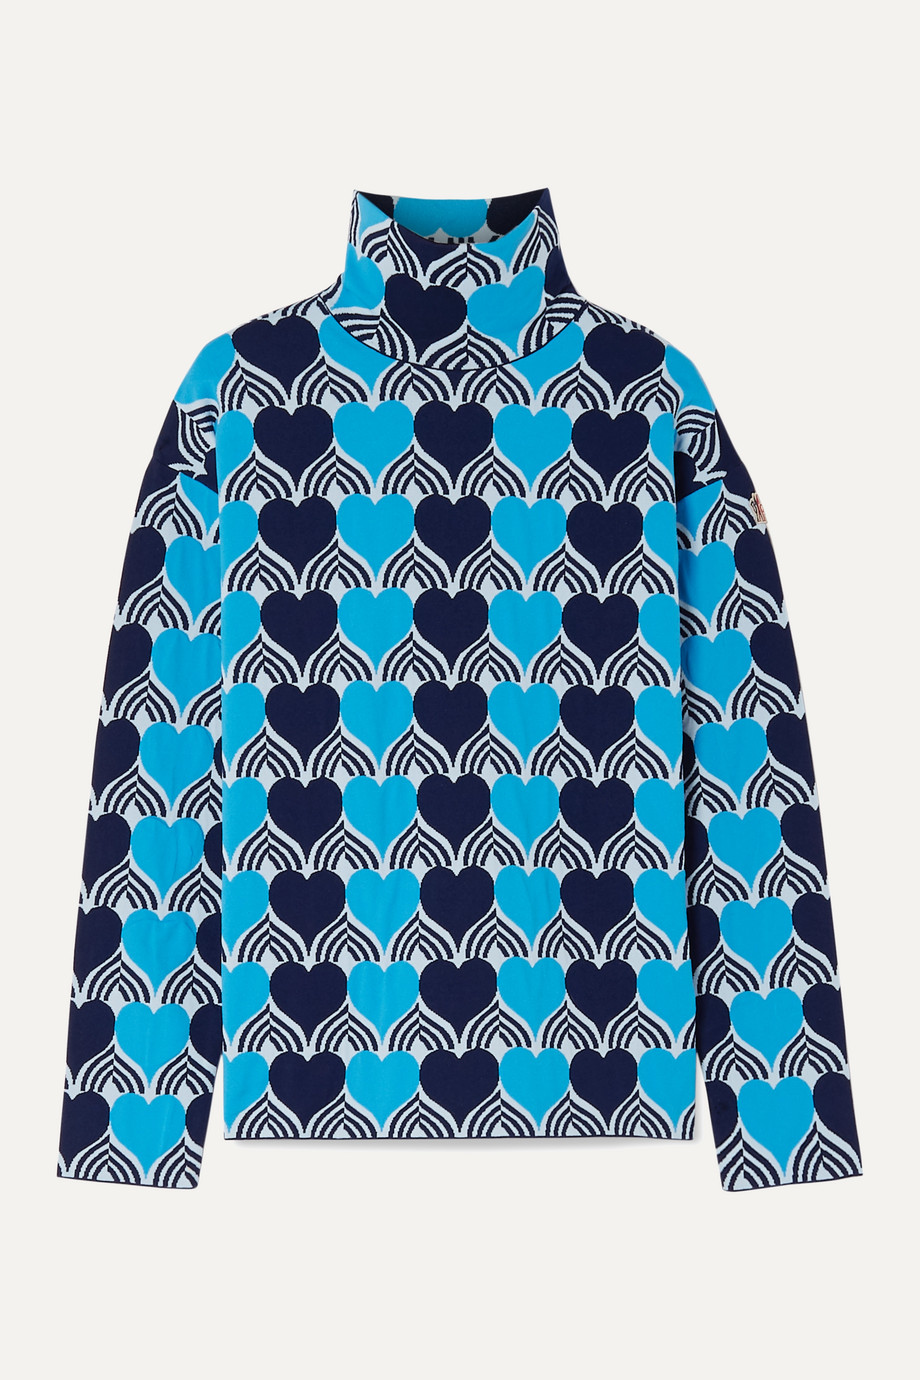 Moncler Genius + 3 Moncler Grenoble jacquard-knit turtleneck top